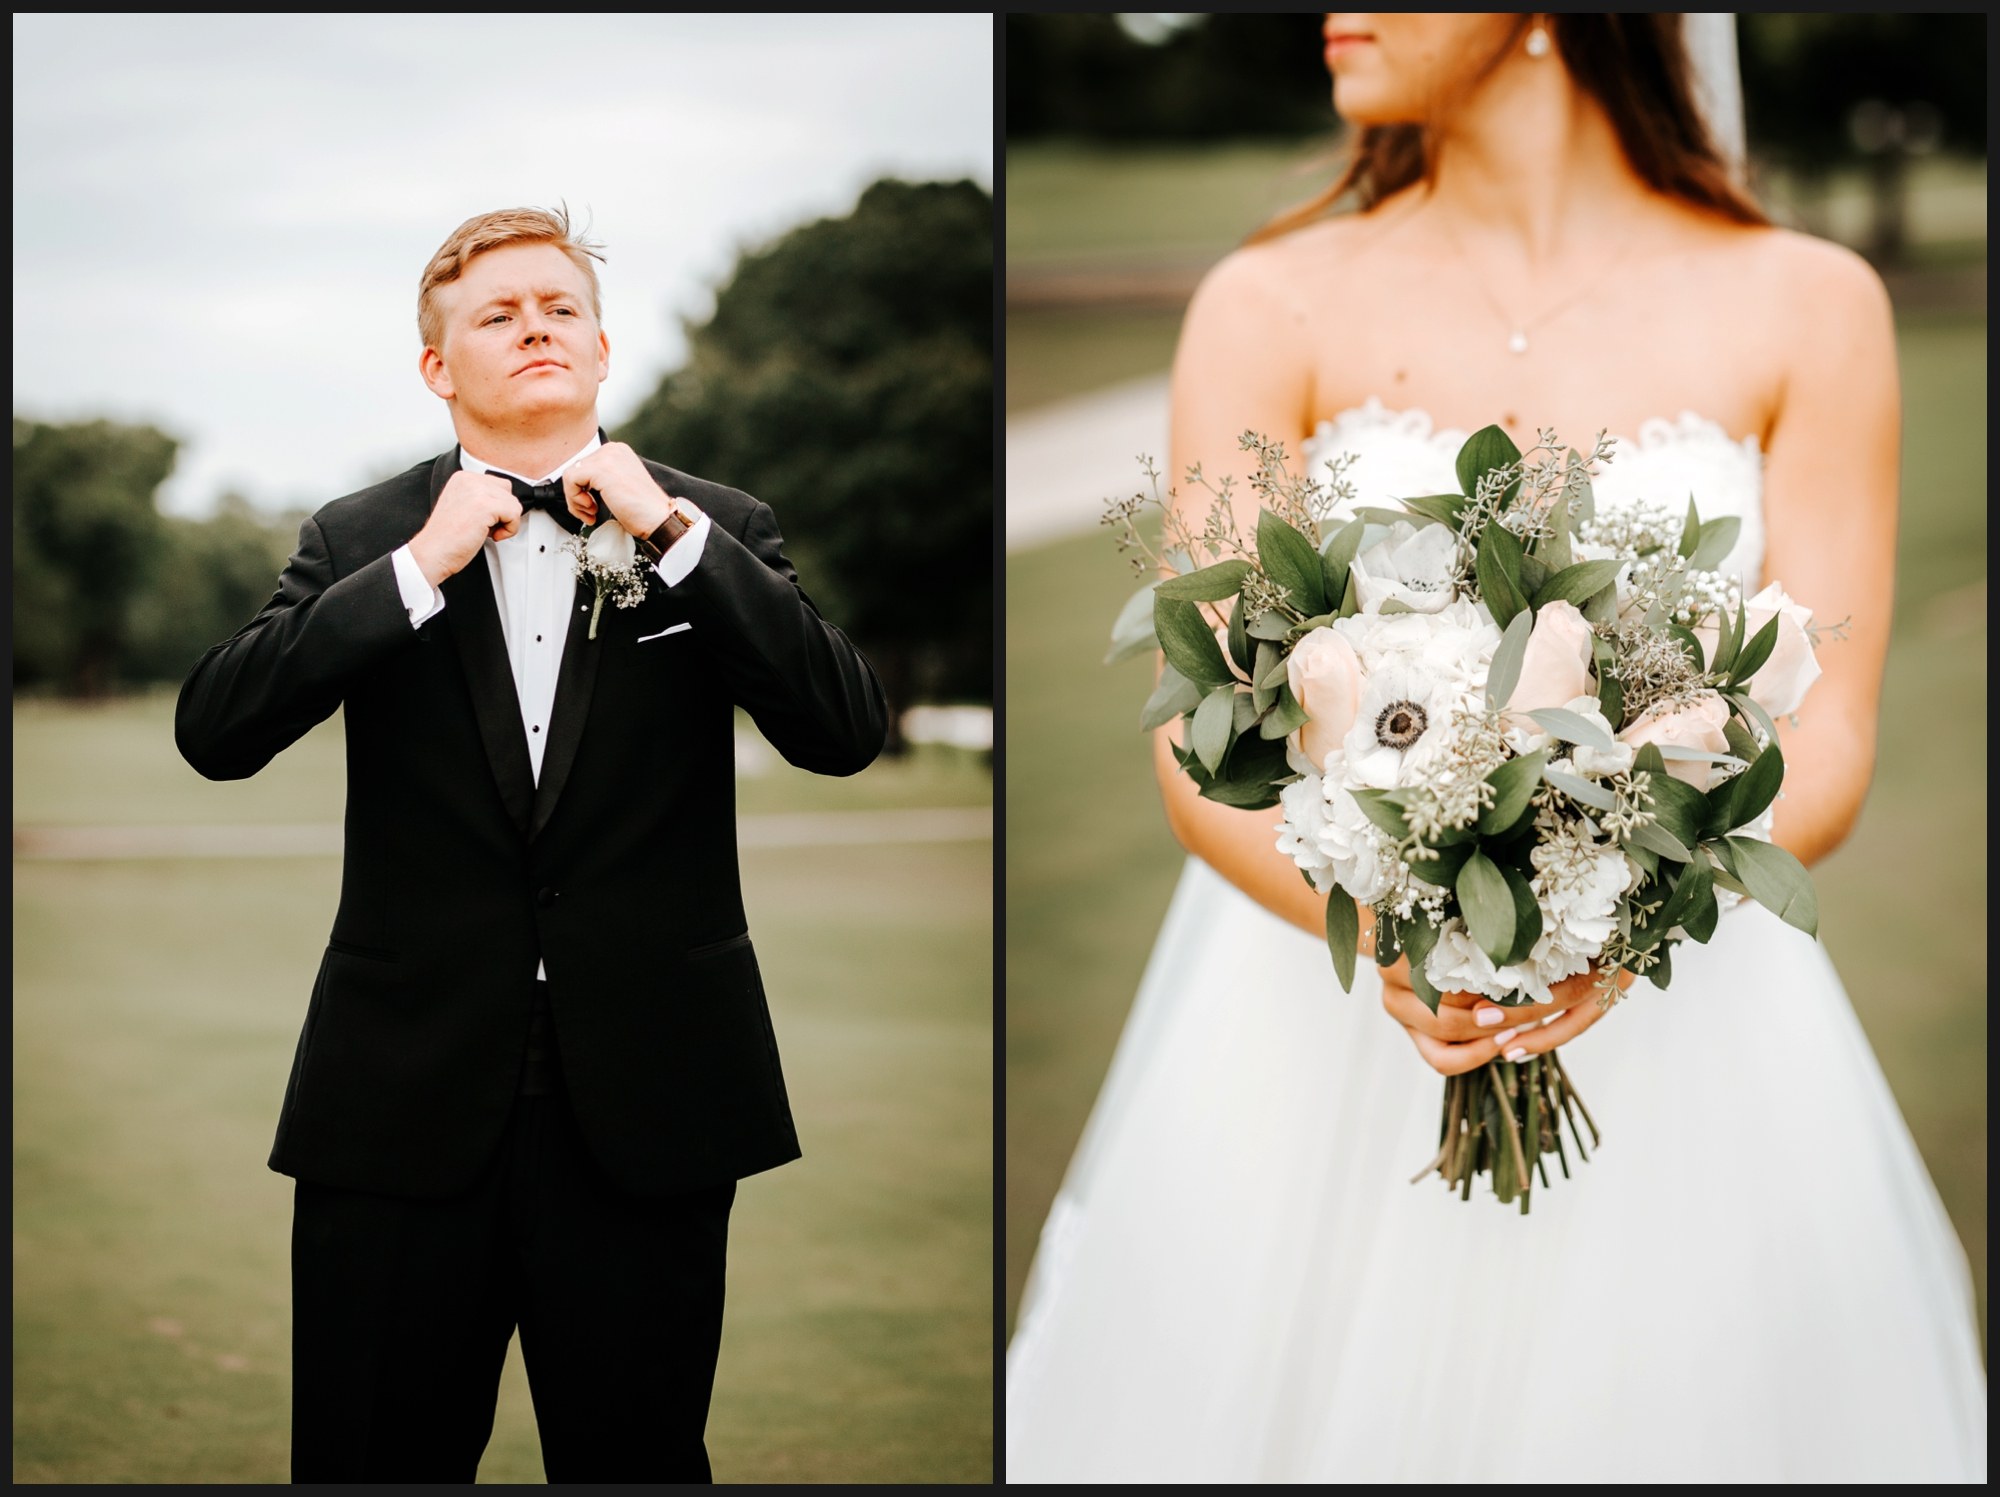 Orlando-Wedding-Photographer-destination-wedding-photographer-florida-wedding-photographer-bohemian-wedding-photographer_0010.jpg